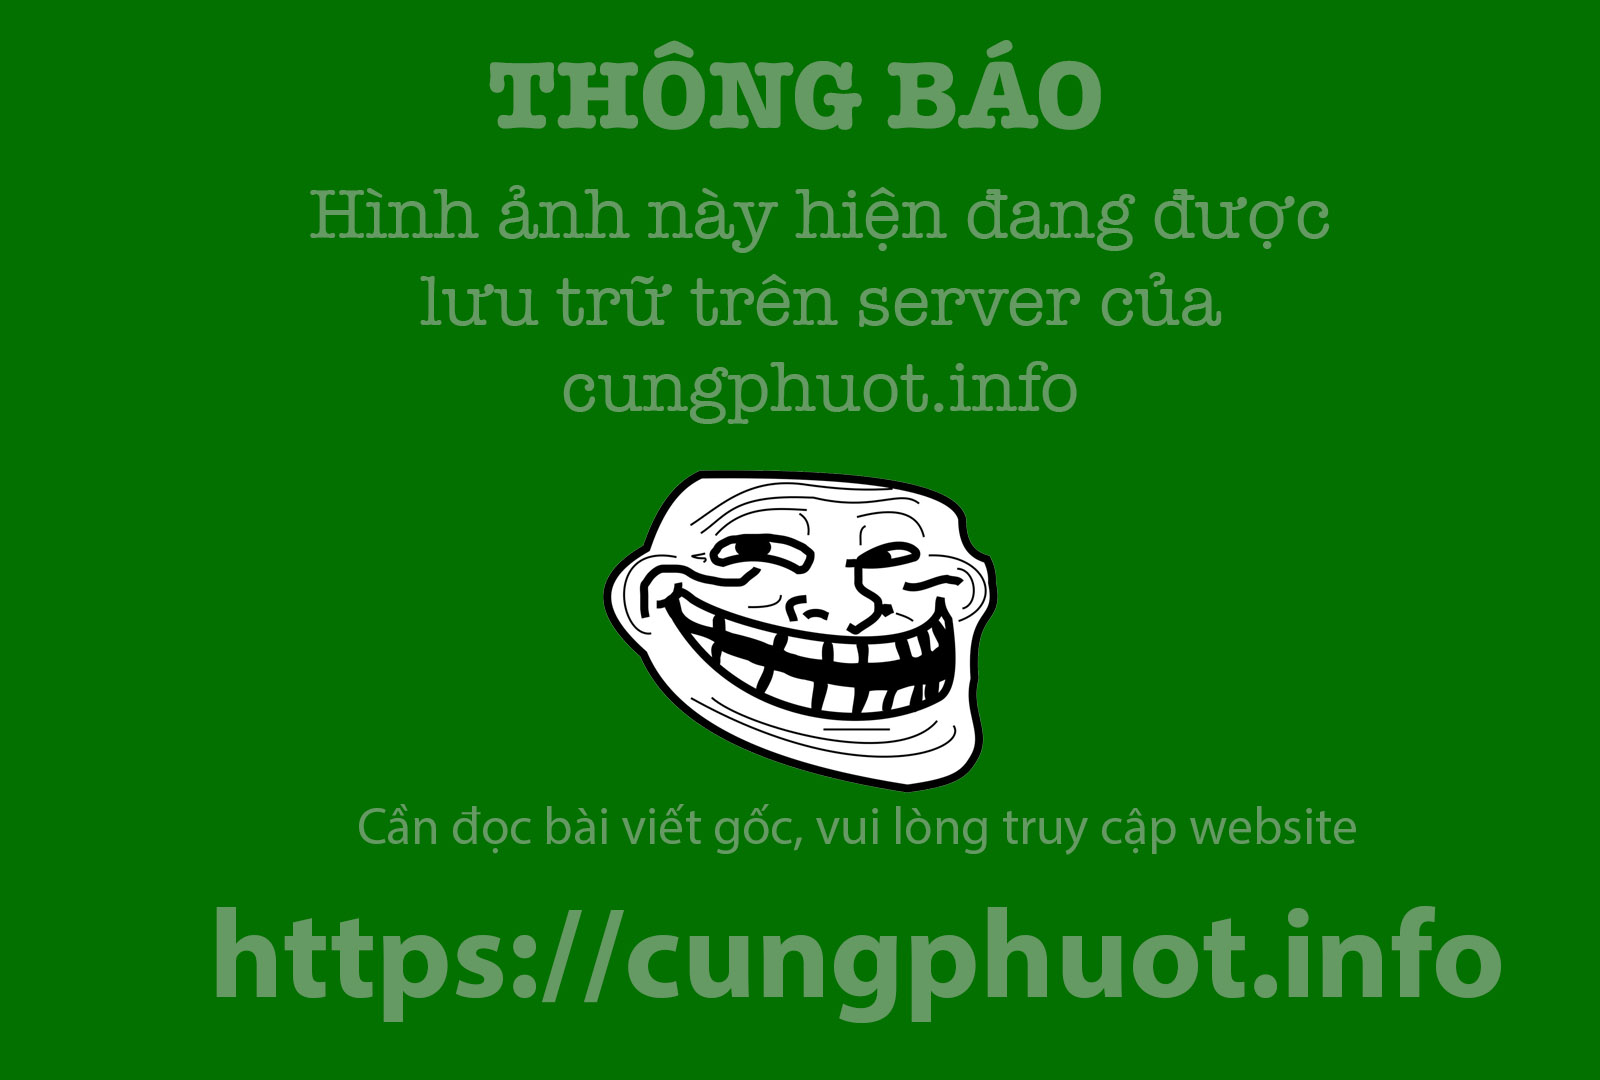 Ve dep thanh cao, huyen bi cua Dan vien Chau Son hinh anh 2